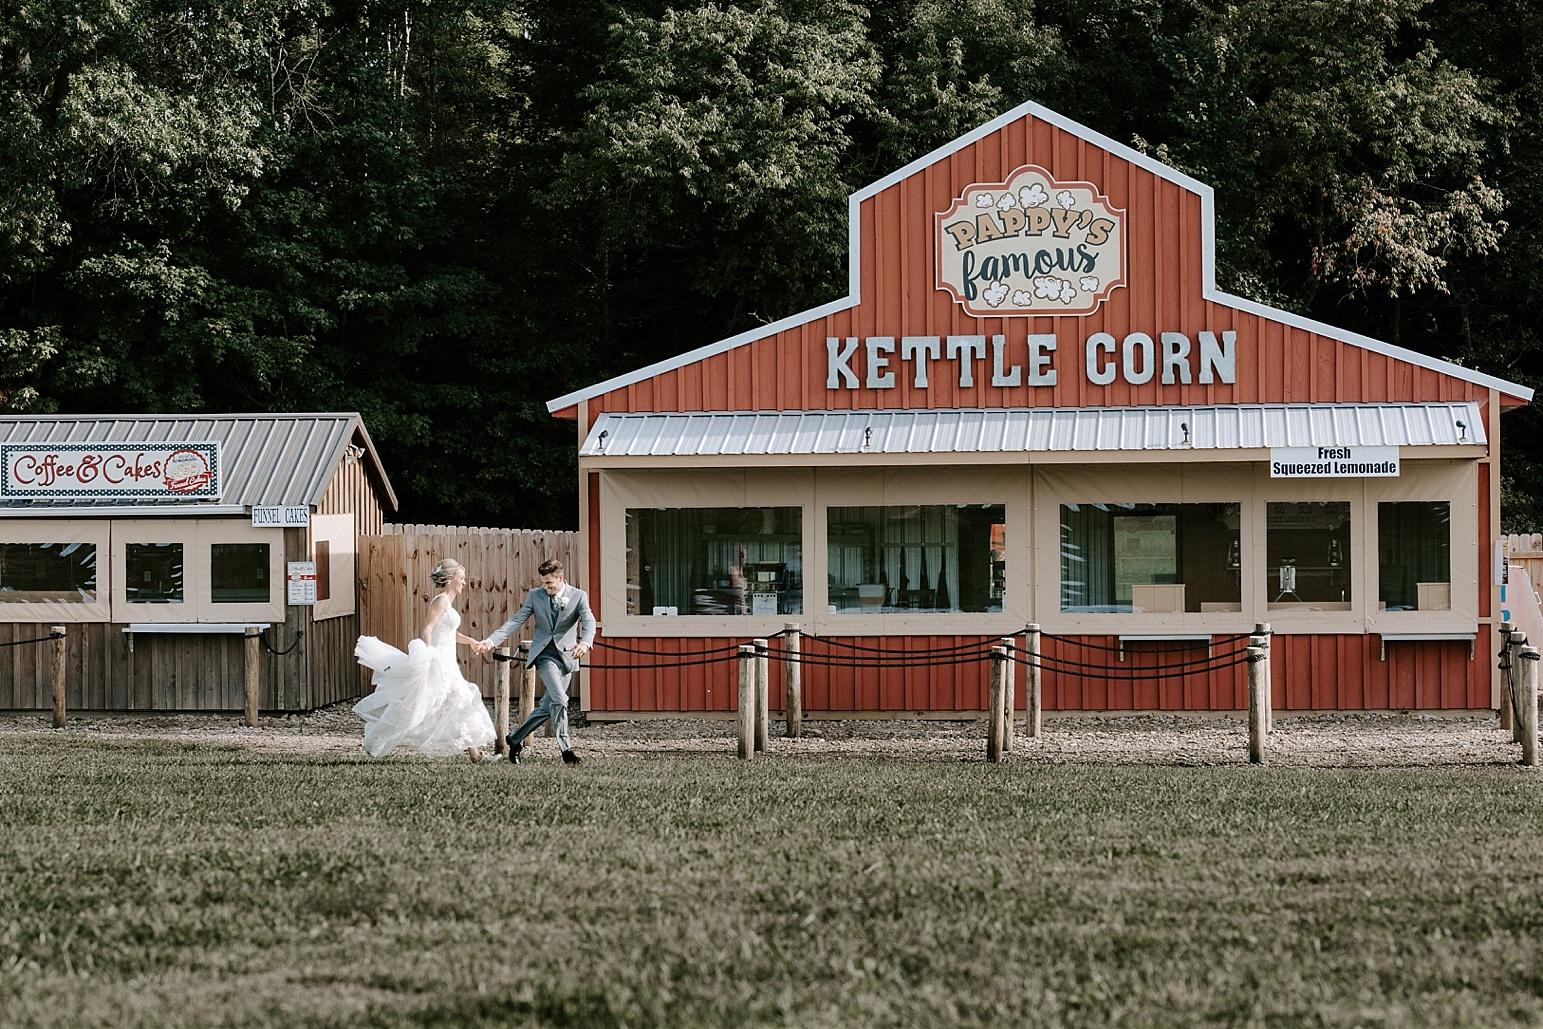 ashley_sara_photography_pittsburgh-wedding-photographer_ohio-wedding-photographer_destination-wedding-photographer13.jpg